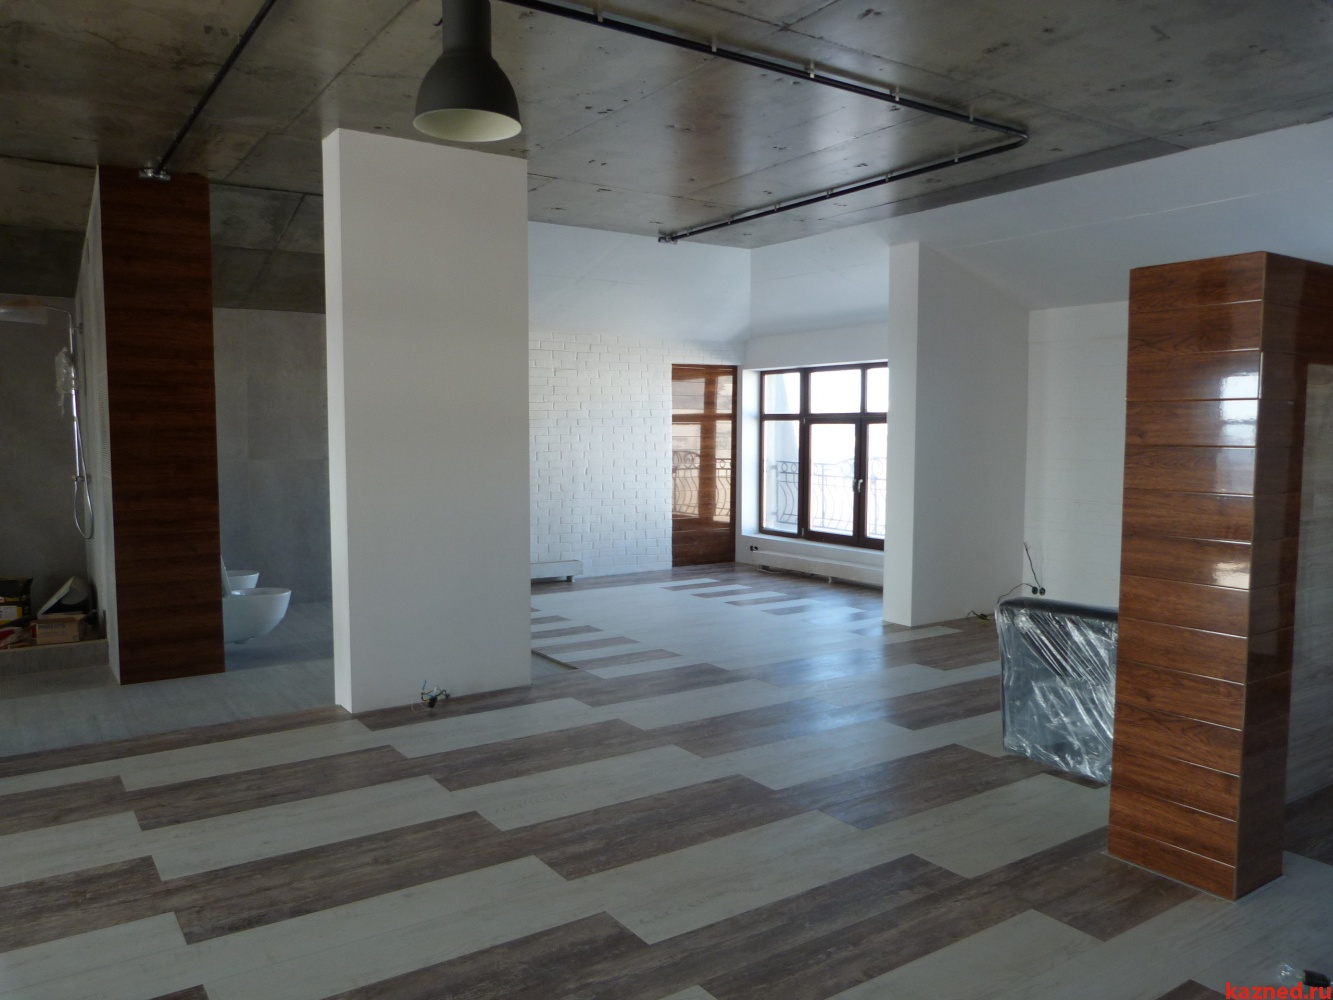 Продажа мн-к квартиры Ульянова-Ленина д.19, 193 м2  (миниатюра №3)